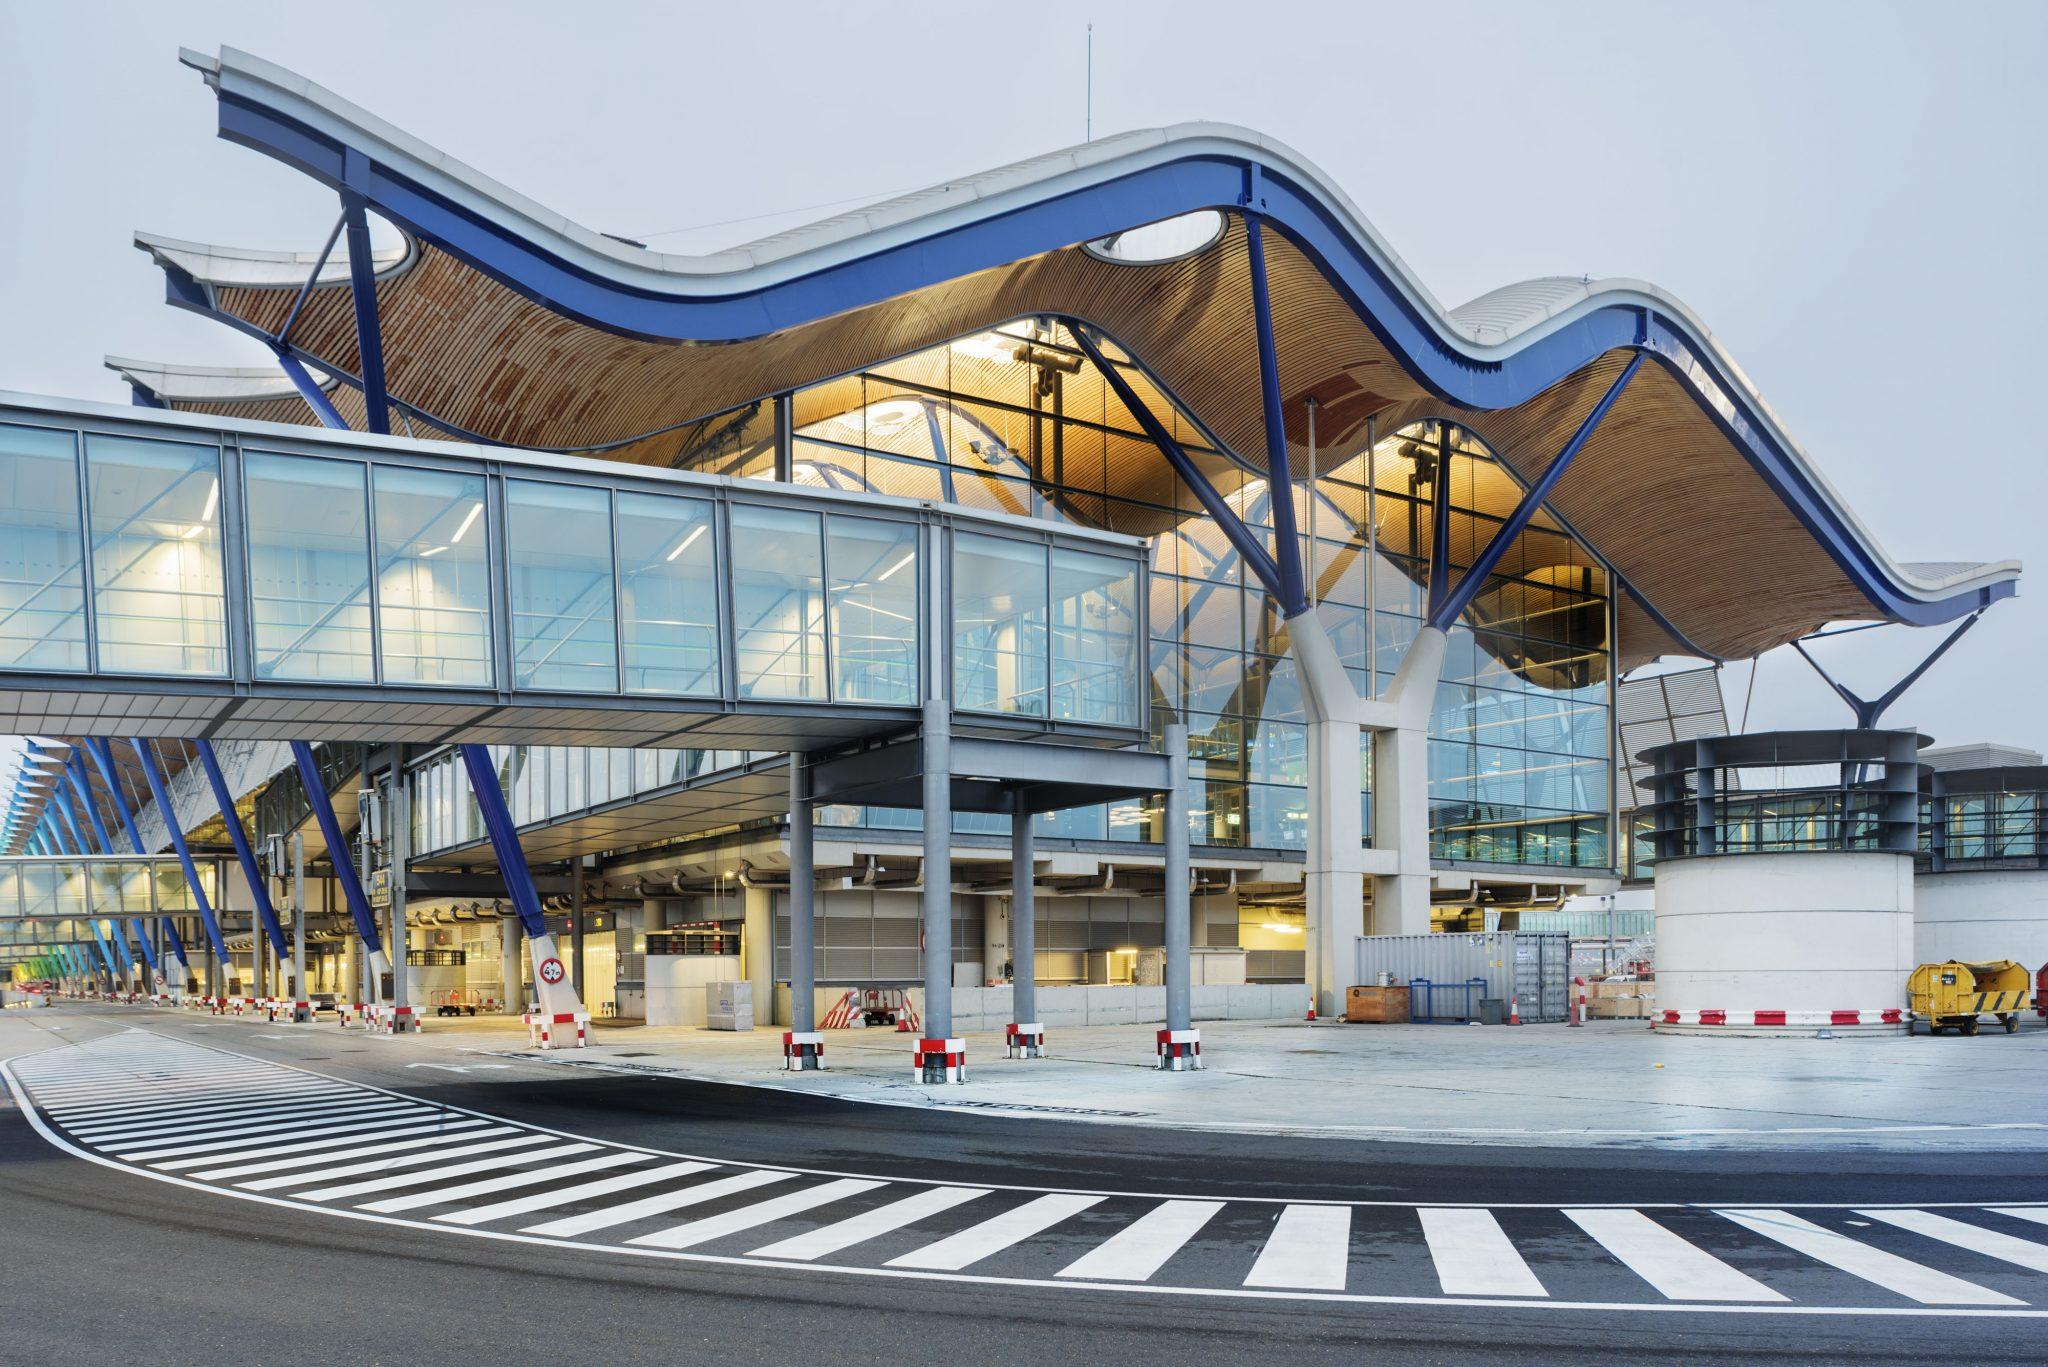 Aeropuerto Adolfo Suárez Madrid-Barajas (exterior)